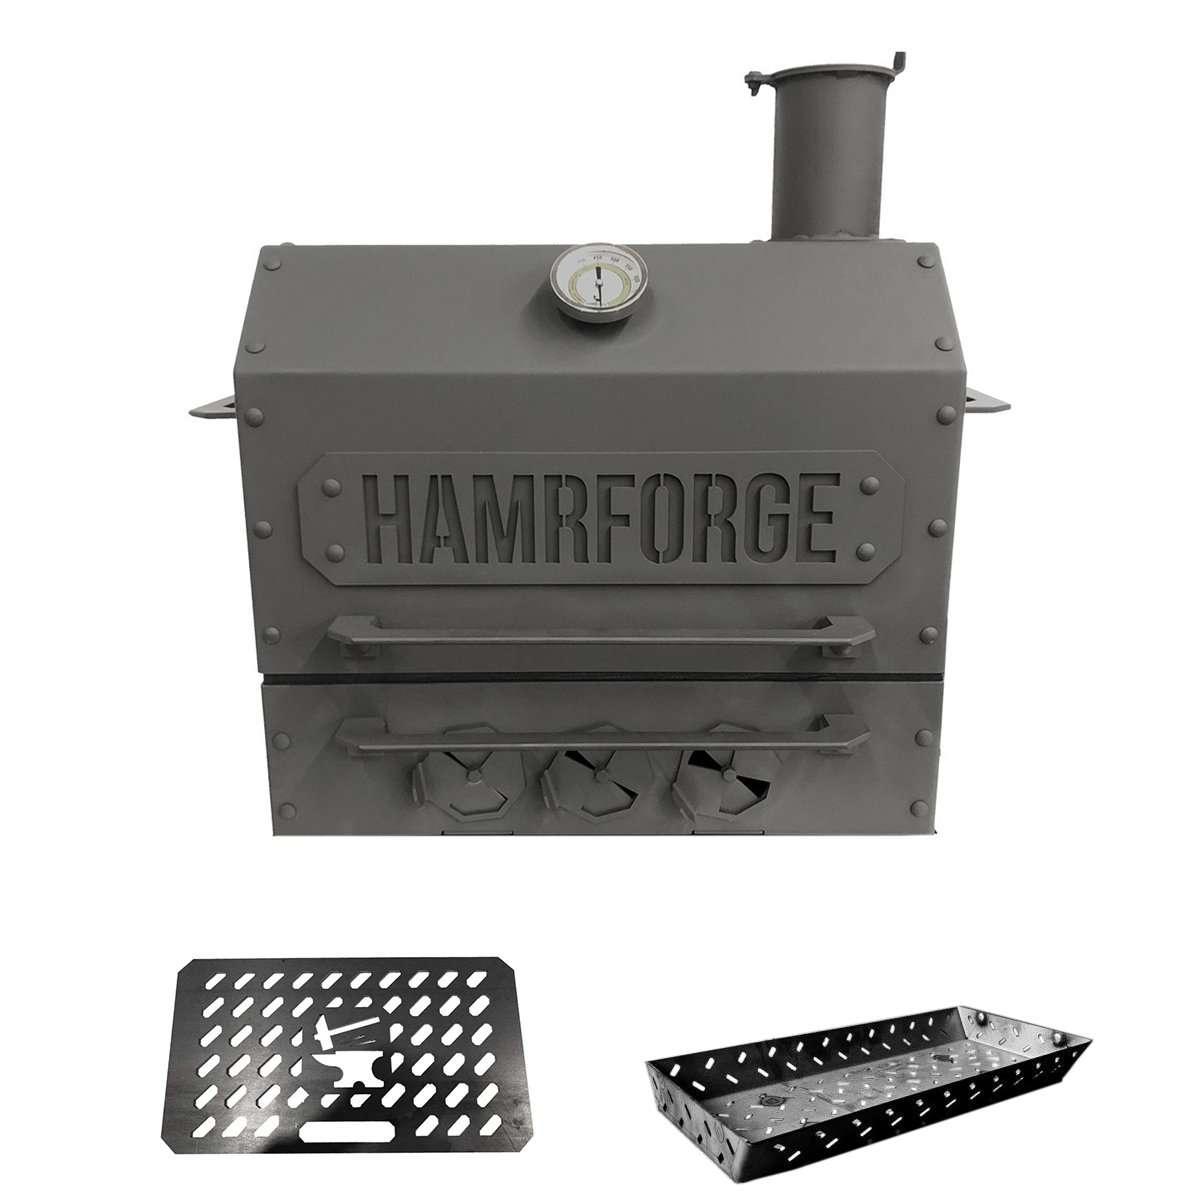 Hamrforge Old Iron Sides Grill Bundle